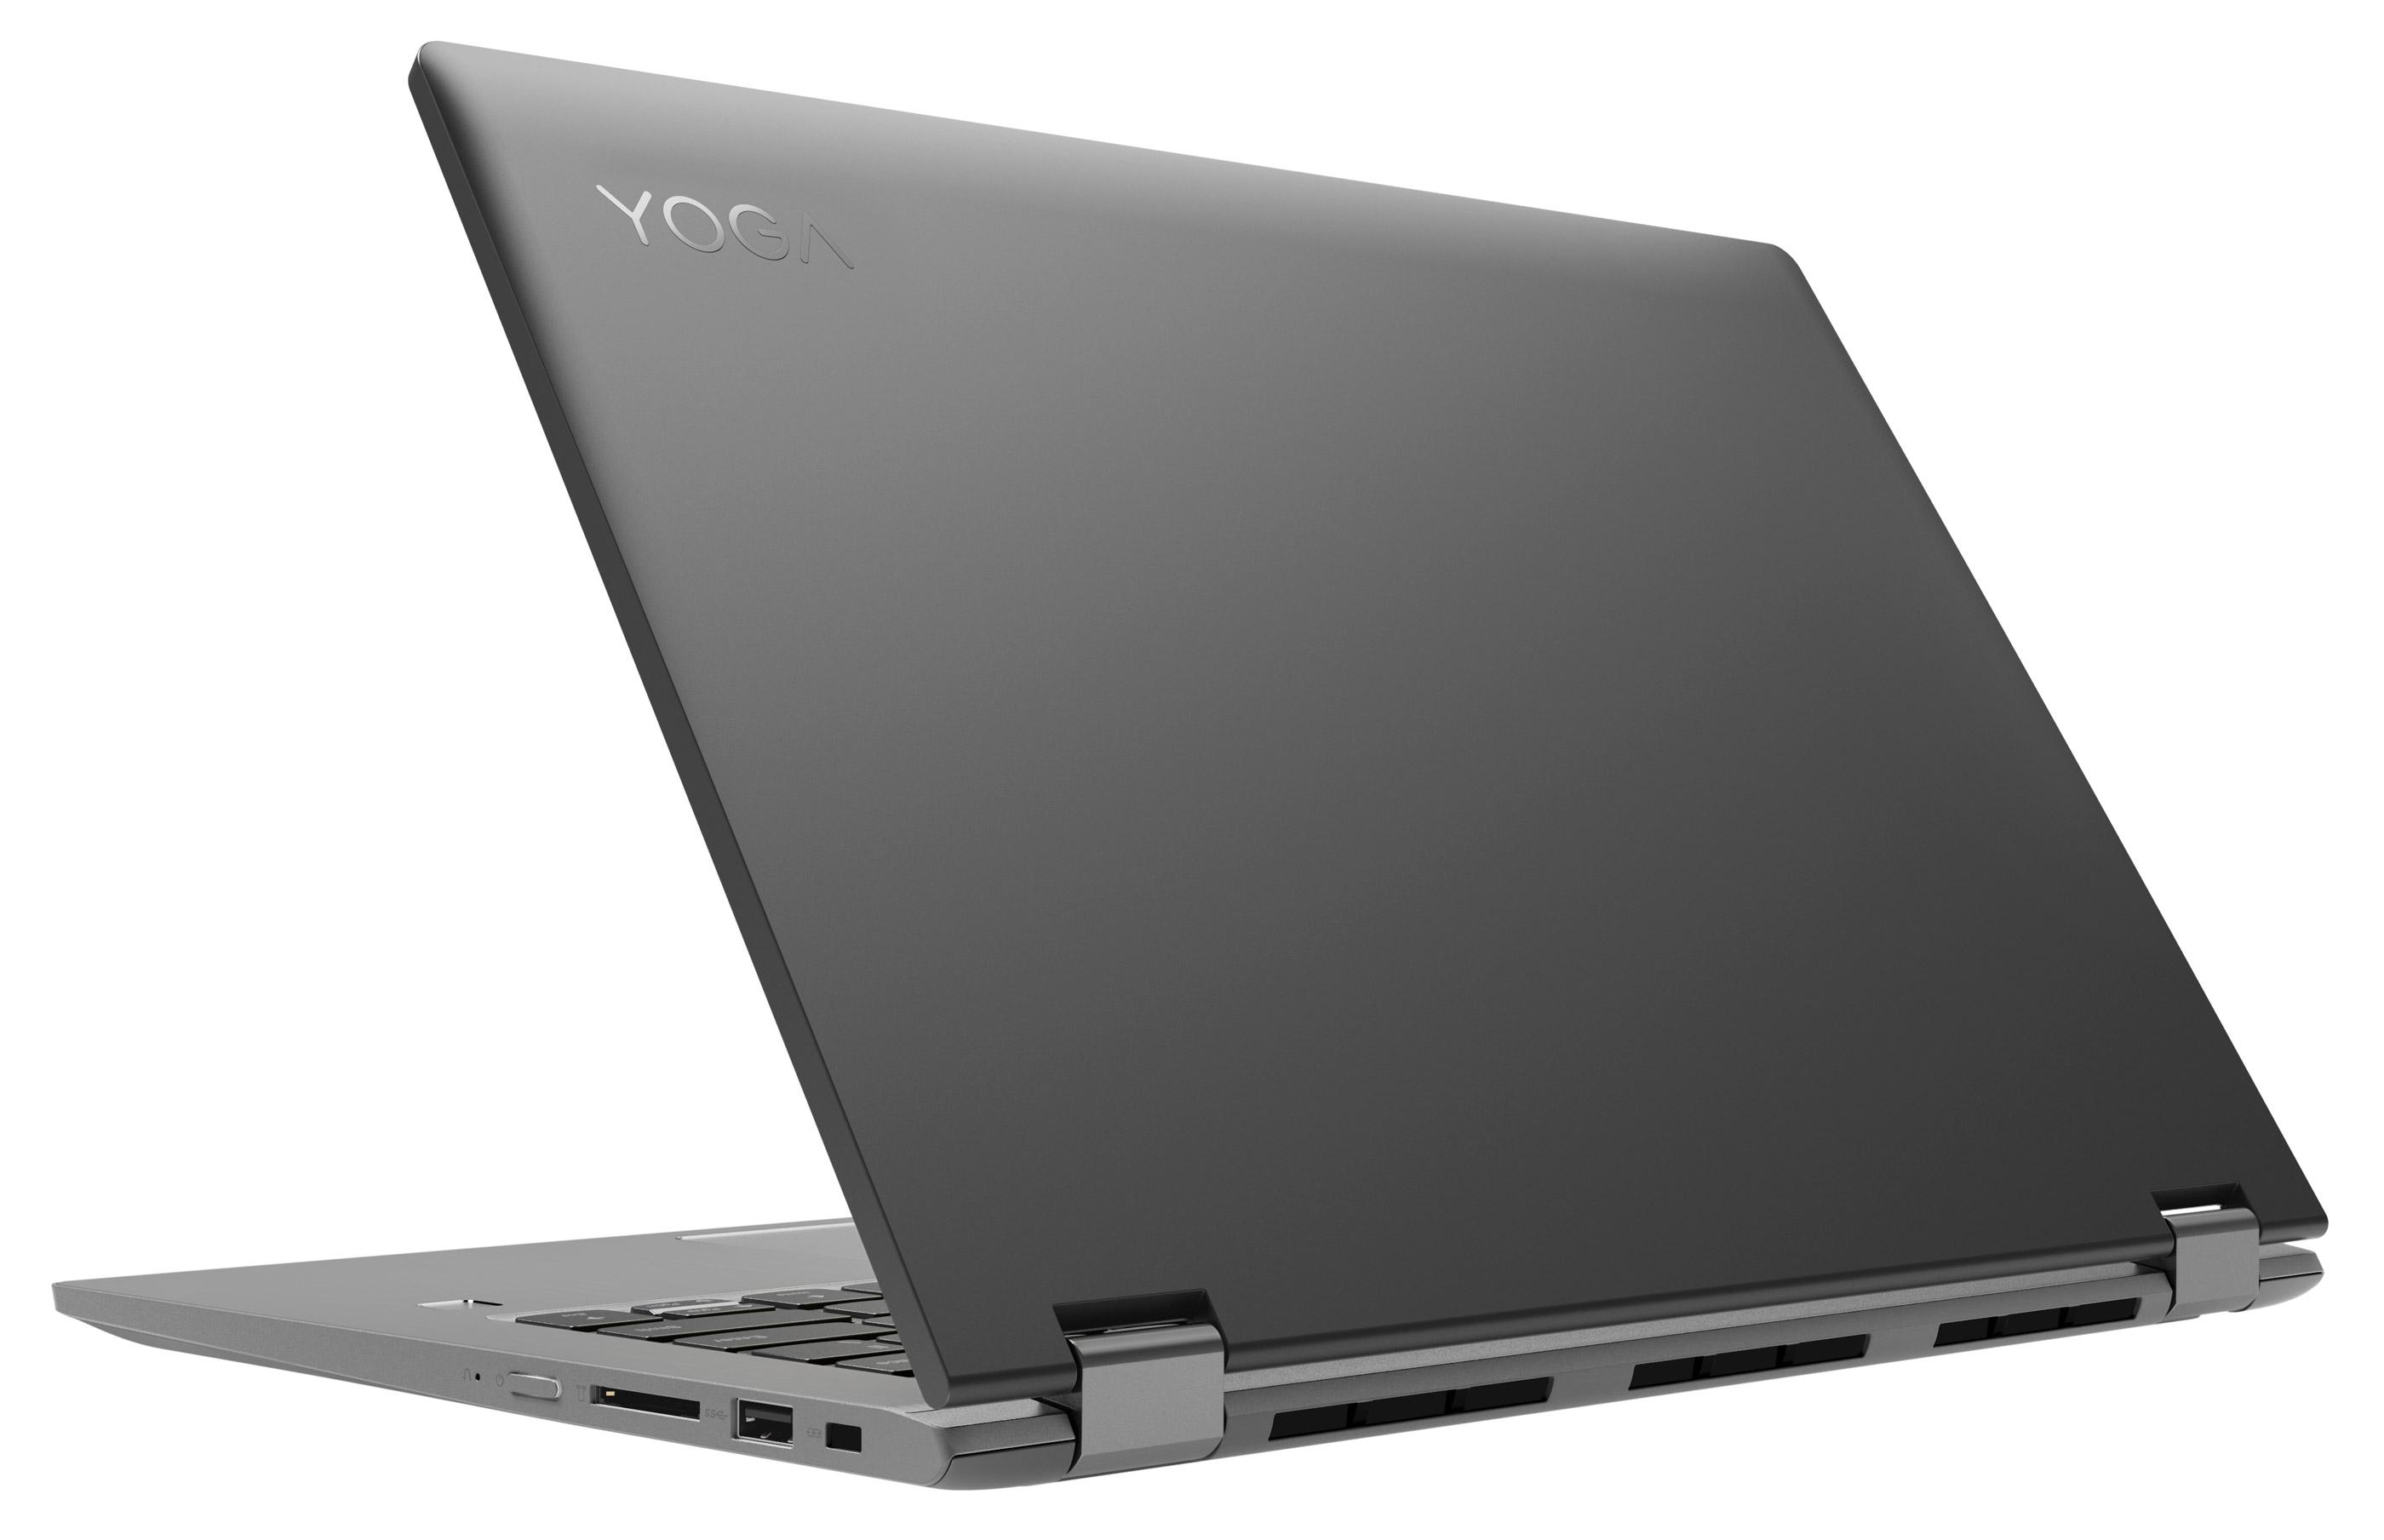 Фото  Ультрабук Lenovo Yoga 530 Onyx Black (81EK00KVRA)